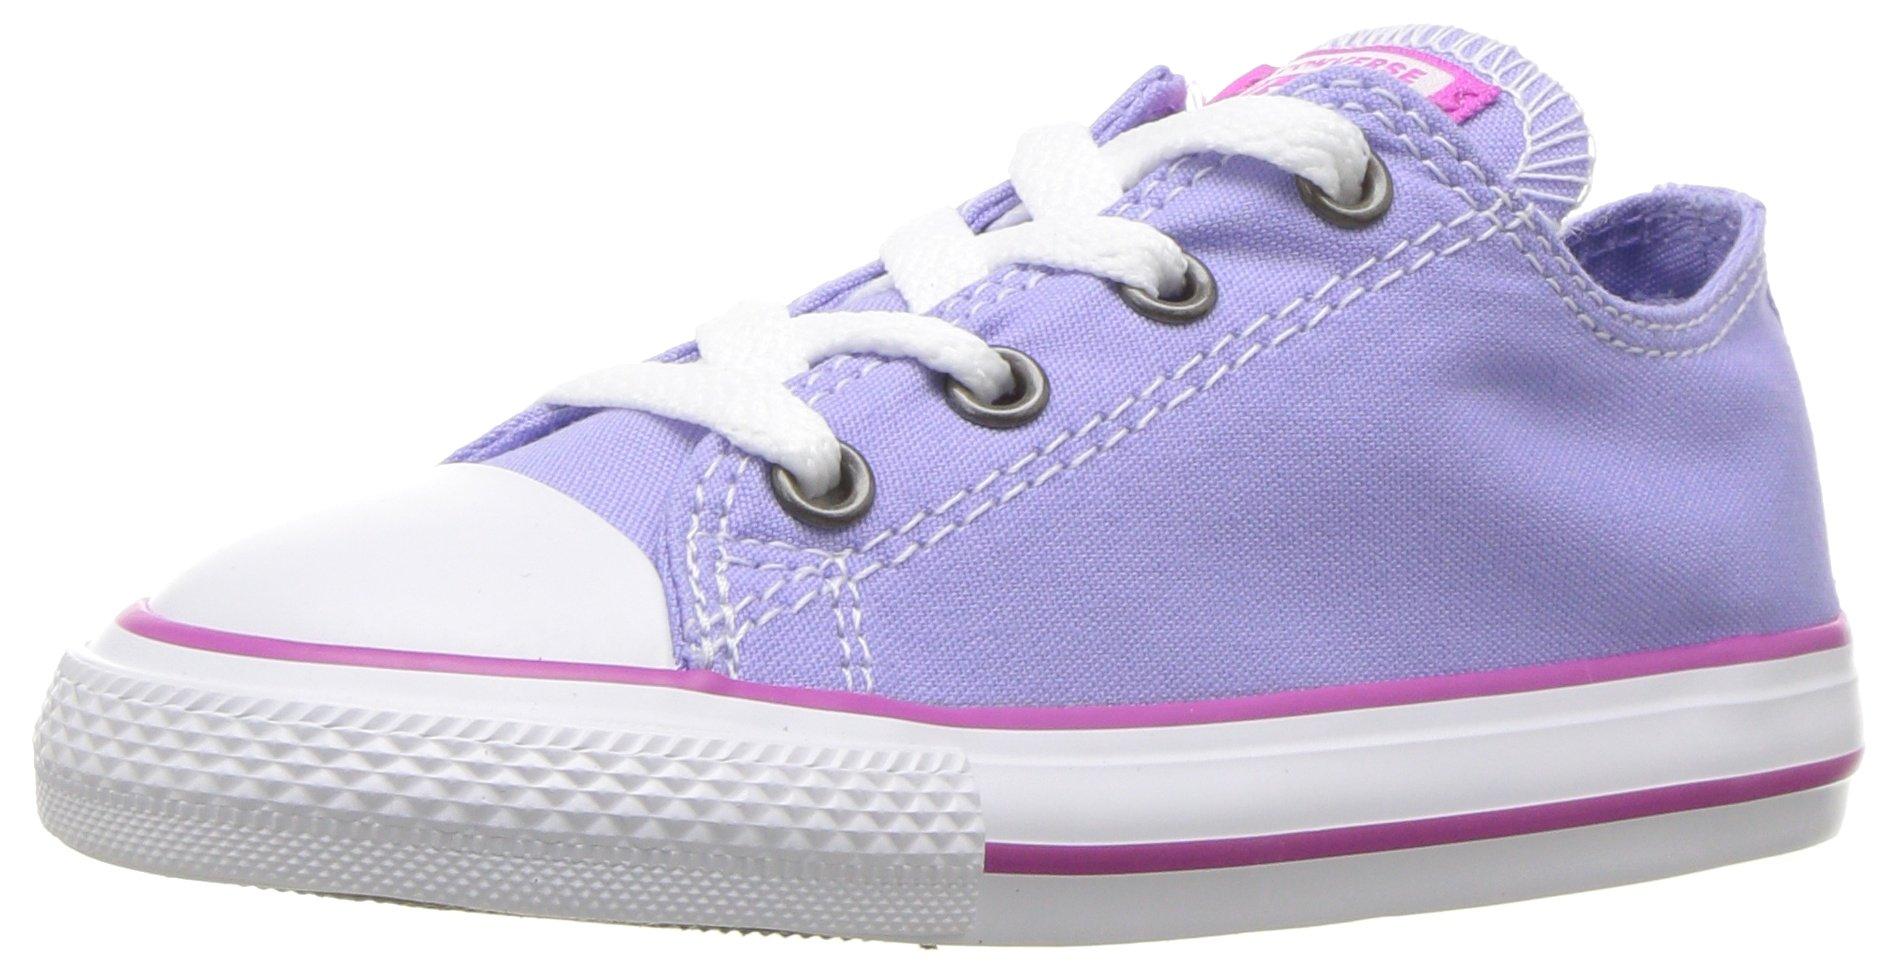 Converse Kids' Chuck Taylor All Star Seasonal Canvas Low Top Sneaker, Twilight Pulse/Hyper Magenta, 9 M US Toddler